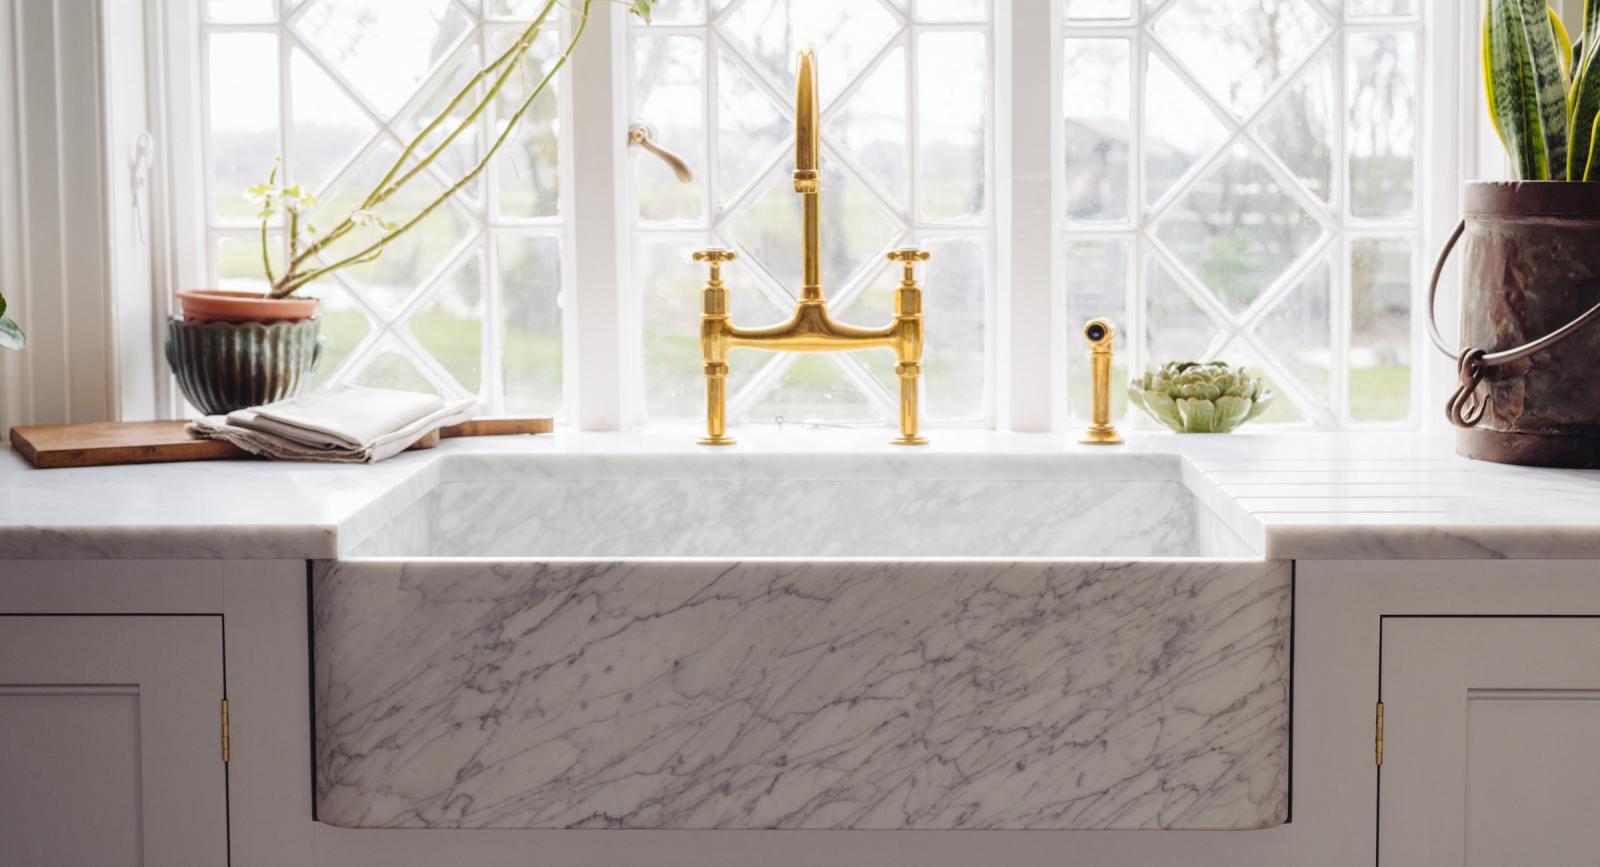 Carrara Marble Sinks By Devol